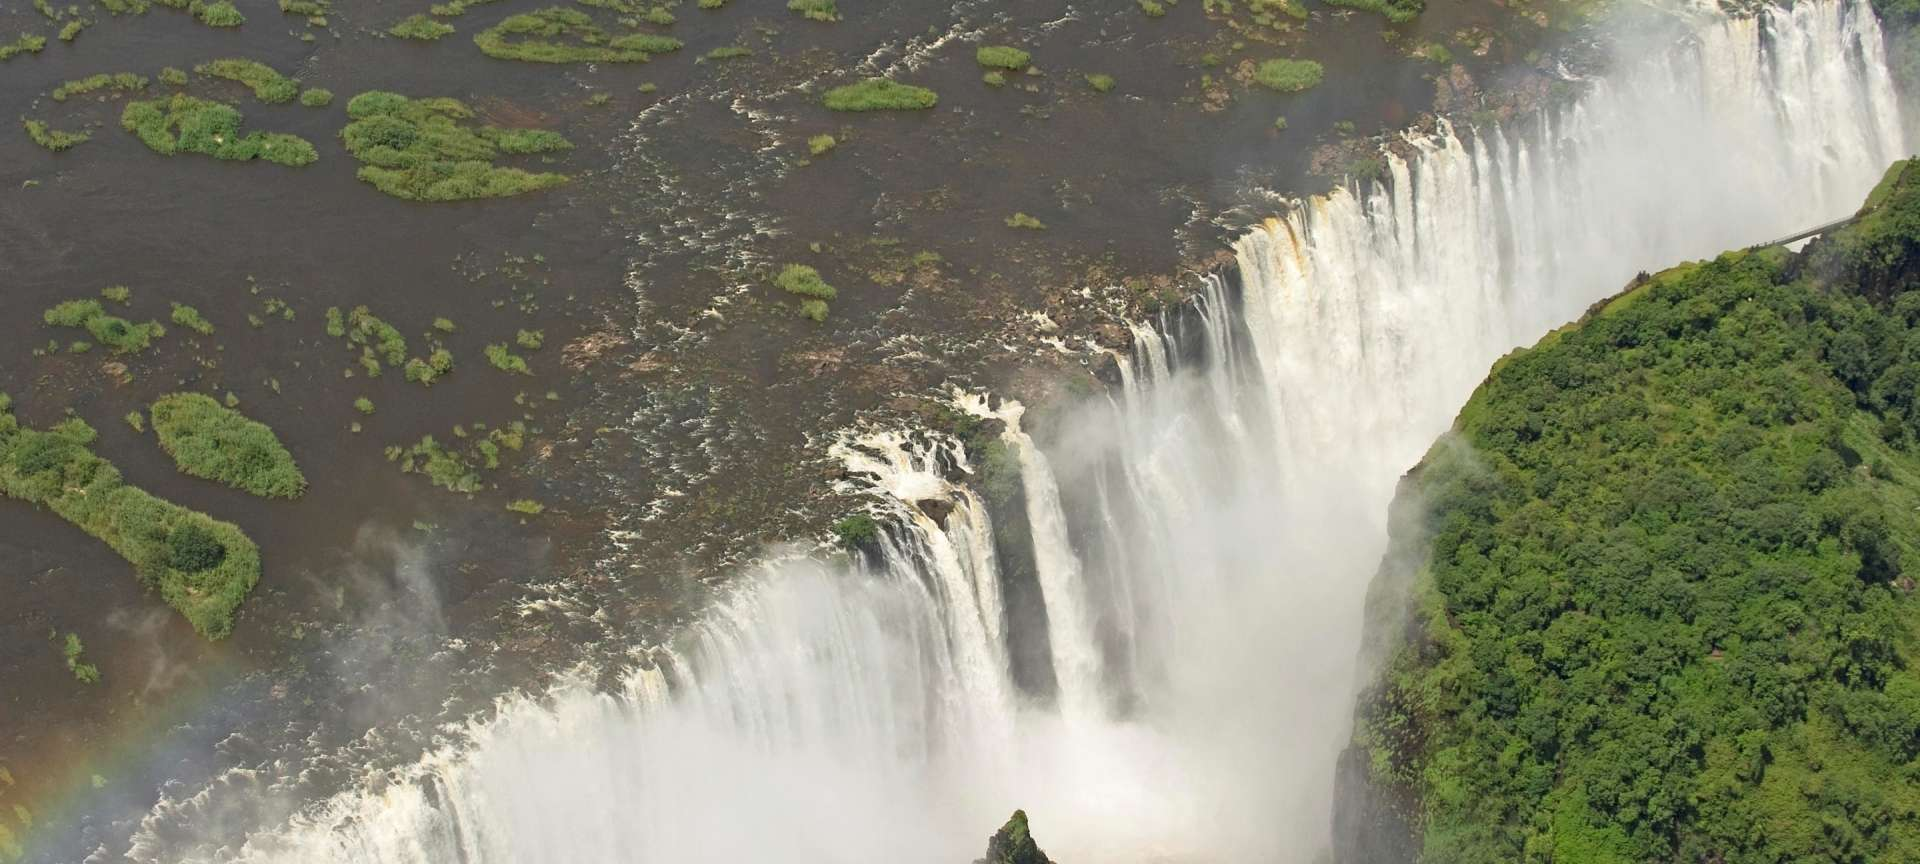 Livingstone - Africa Wildlife Safaris